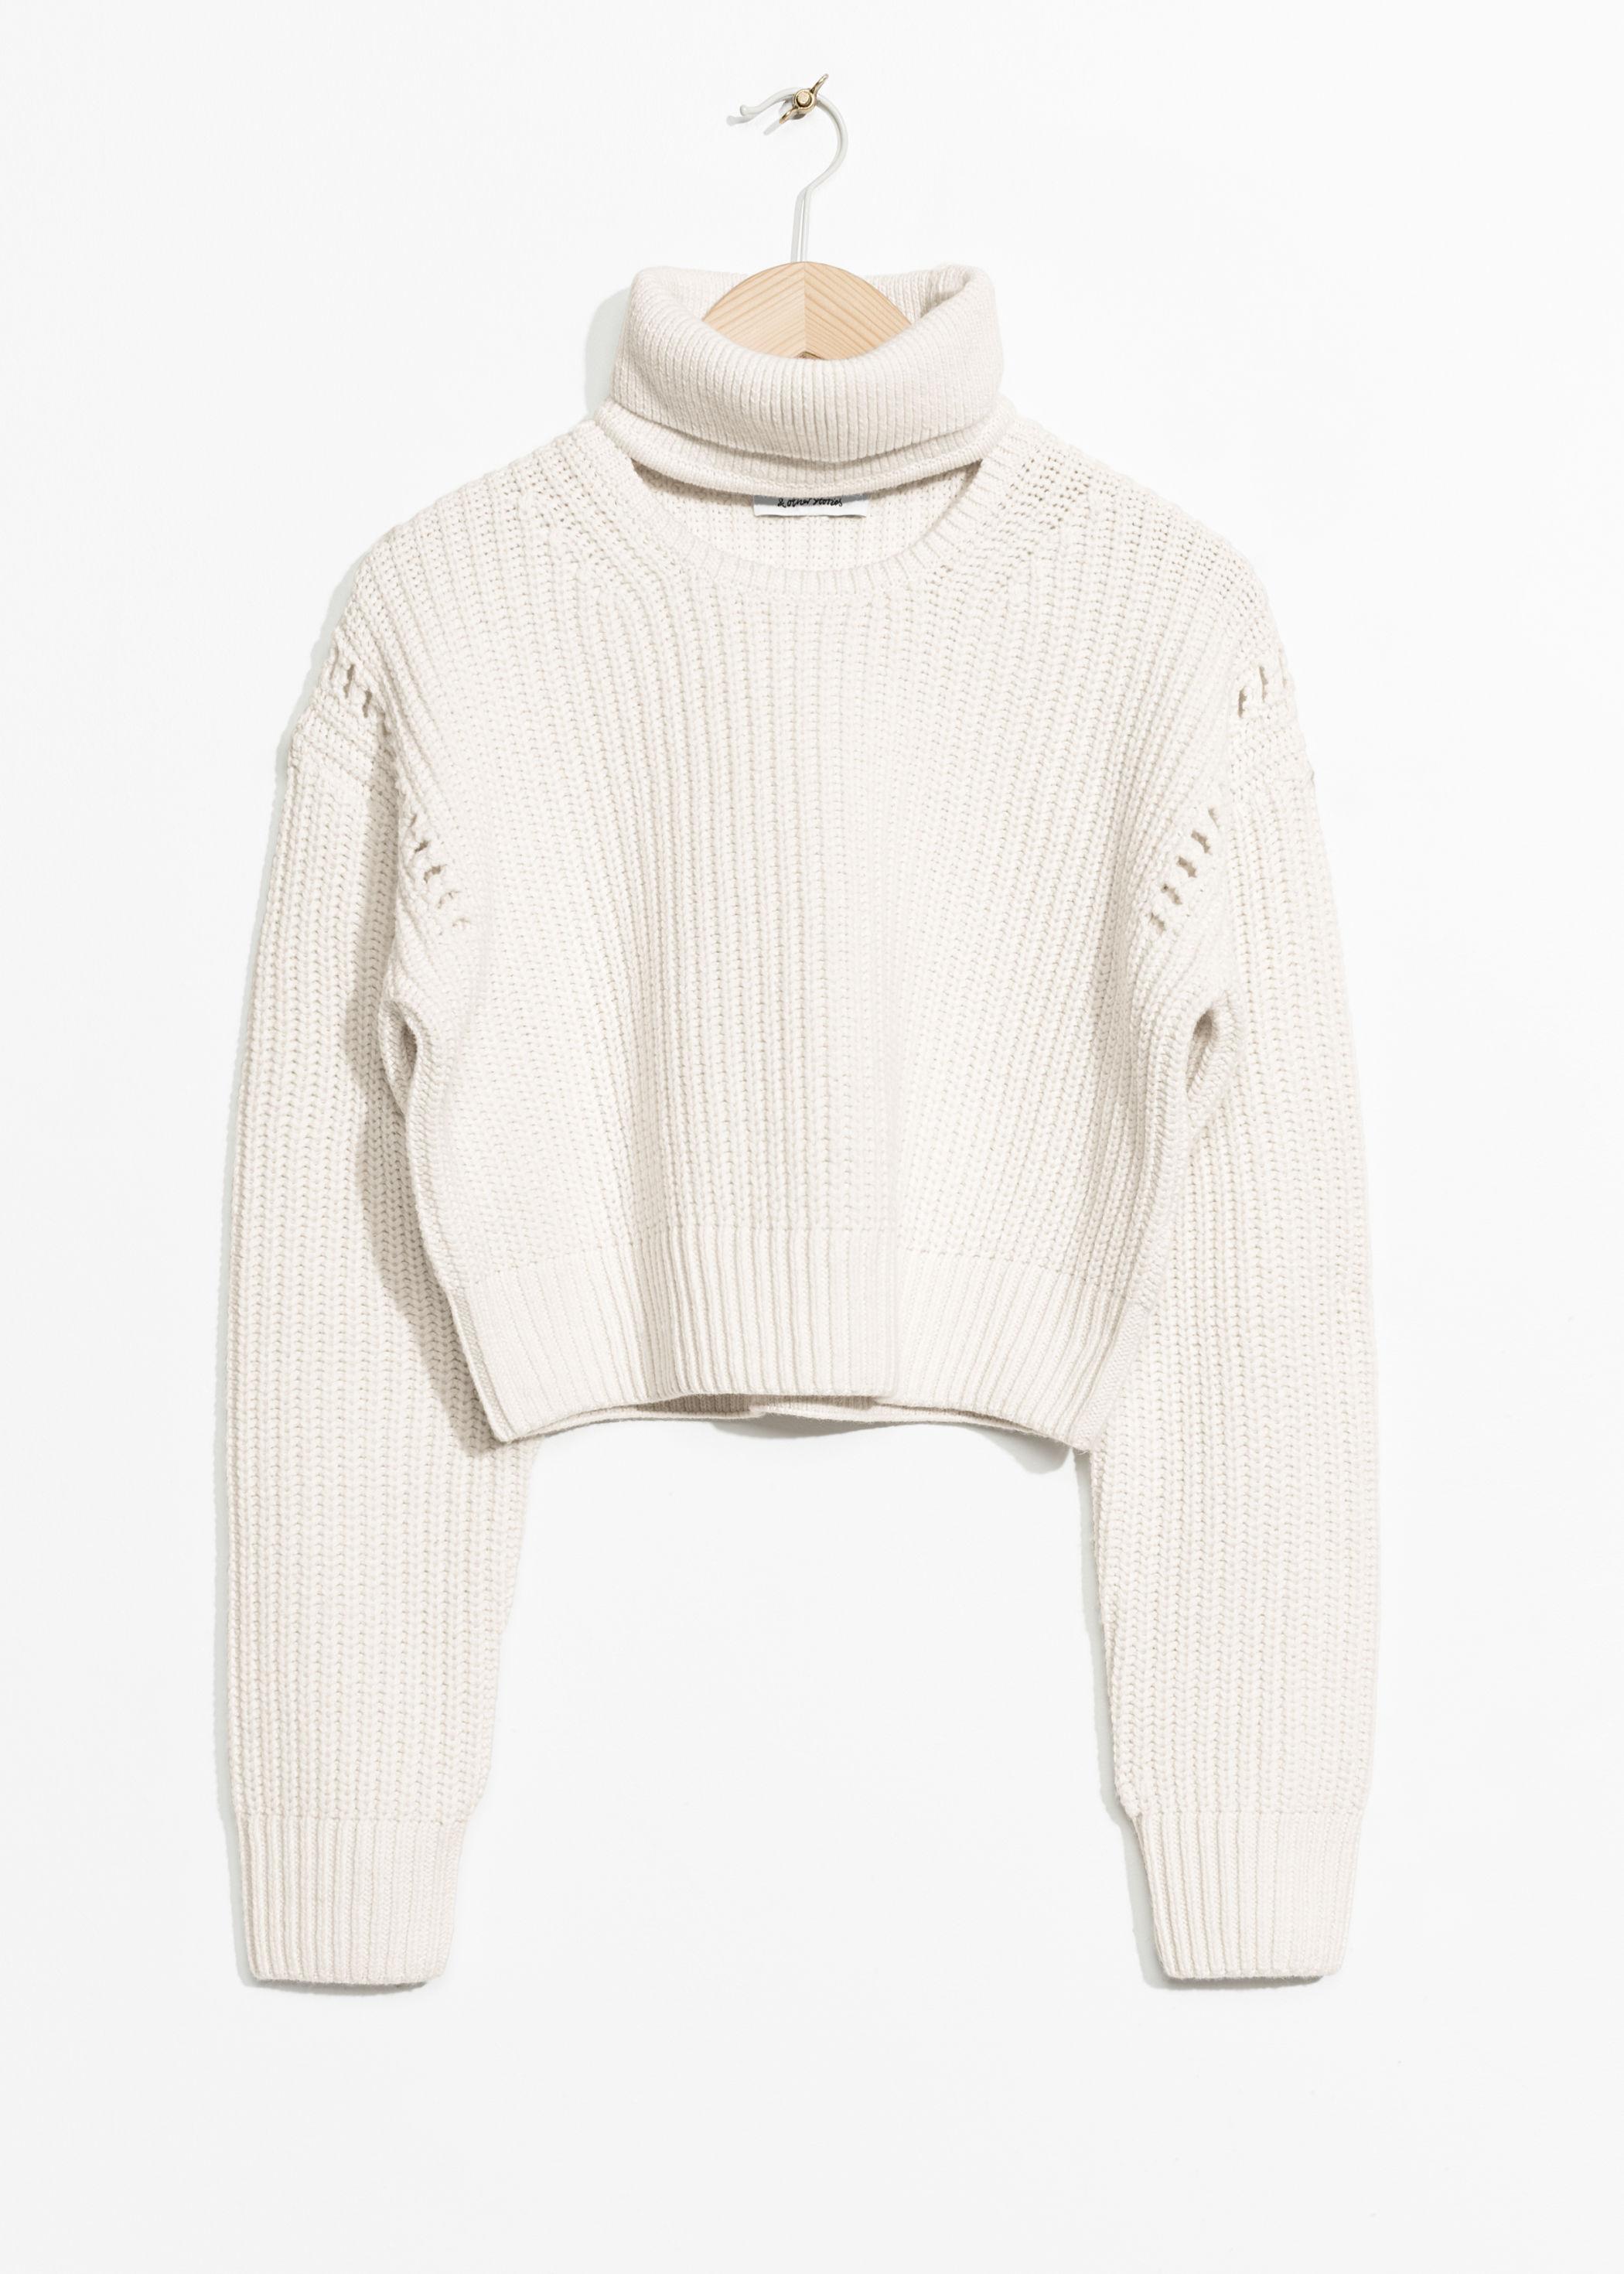 6d2c44974b5 Crop Turtleneck Sweater